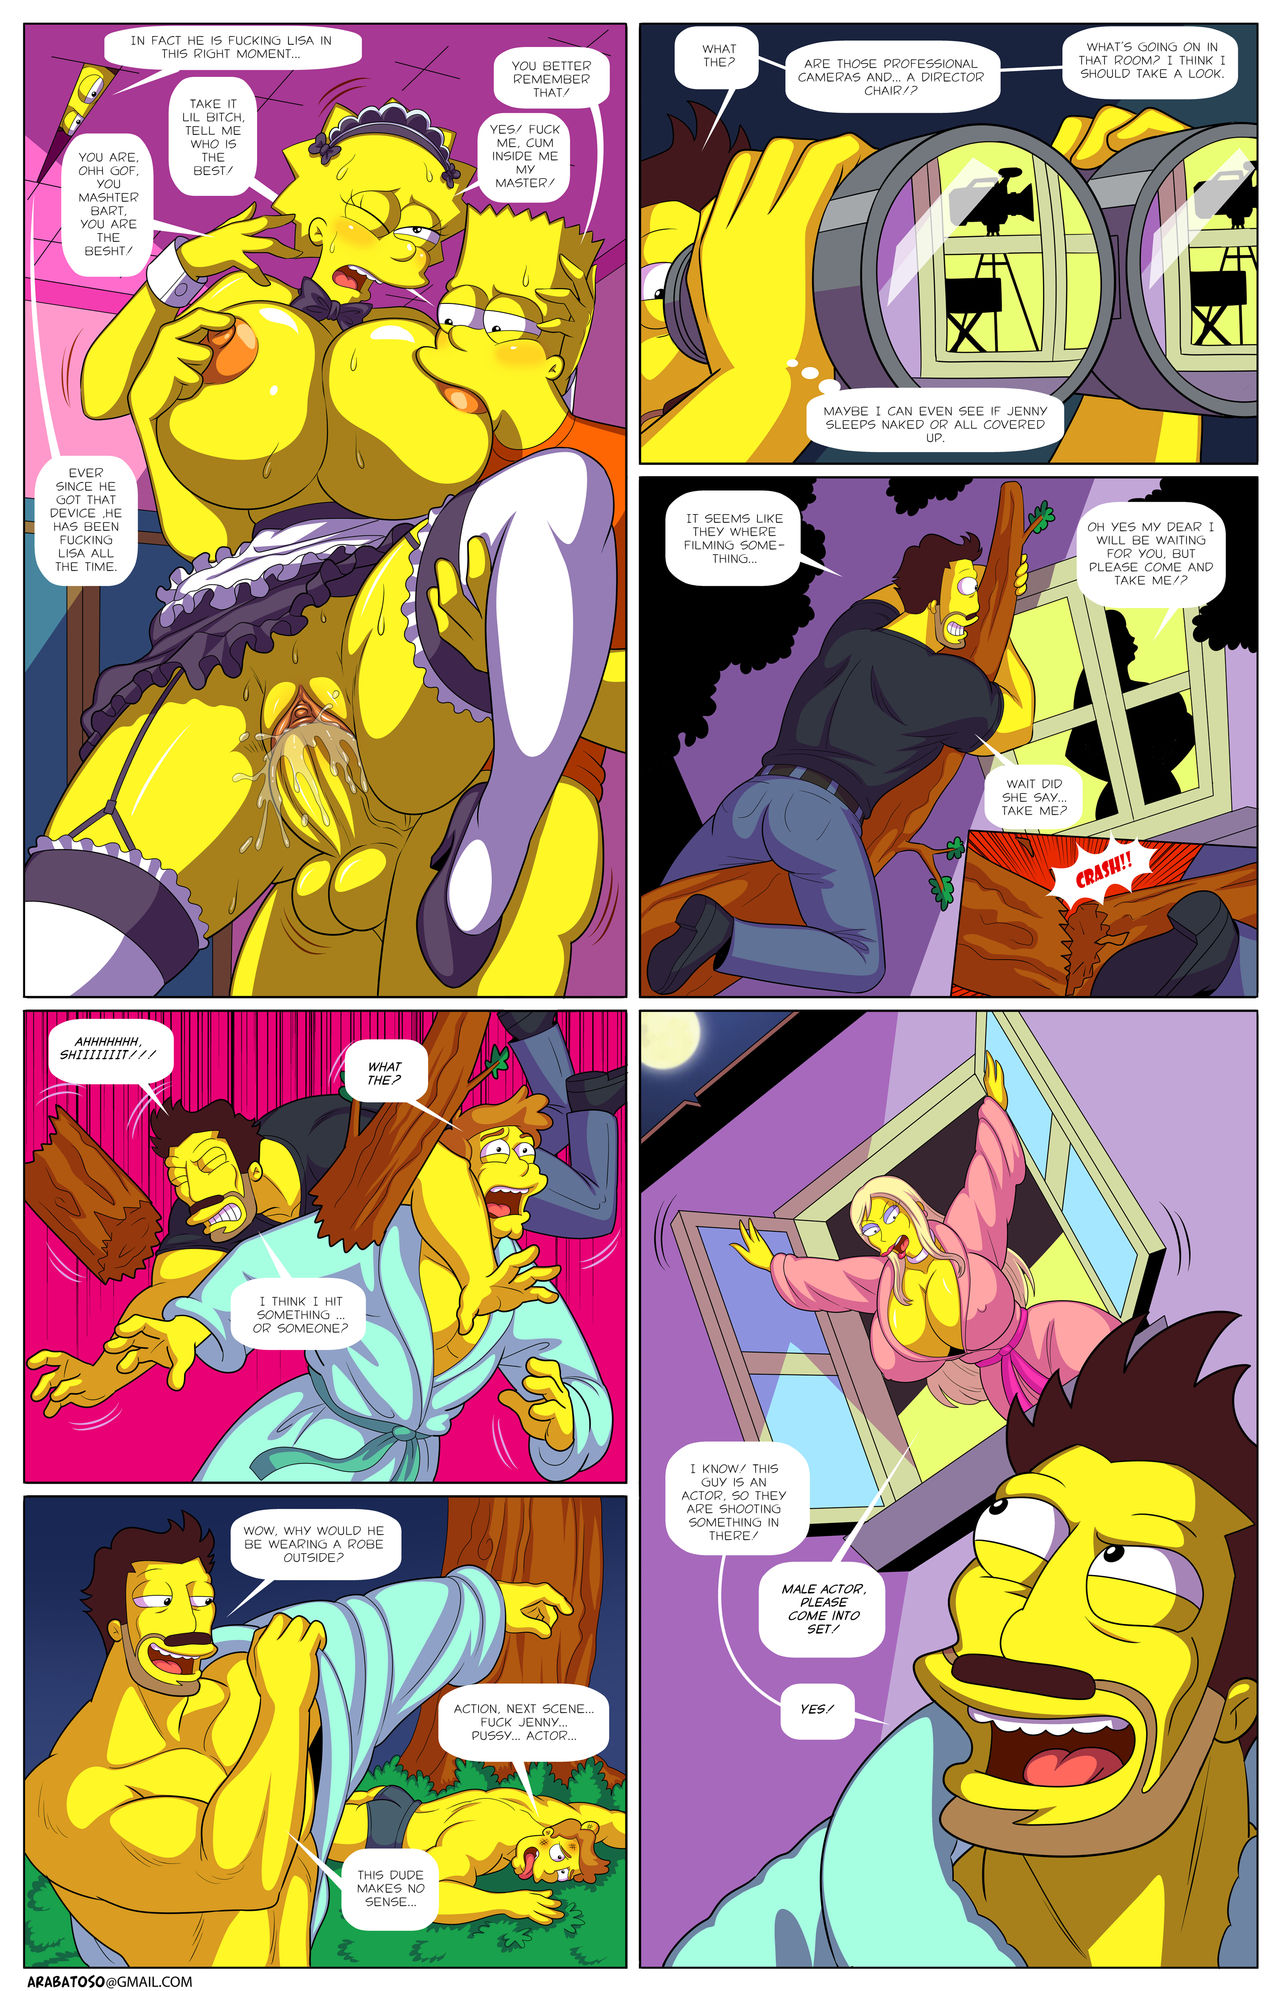 Porn simpsons online pictures